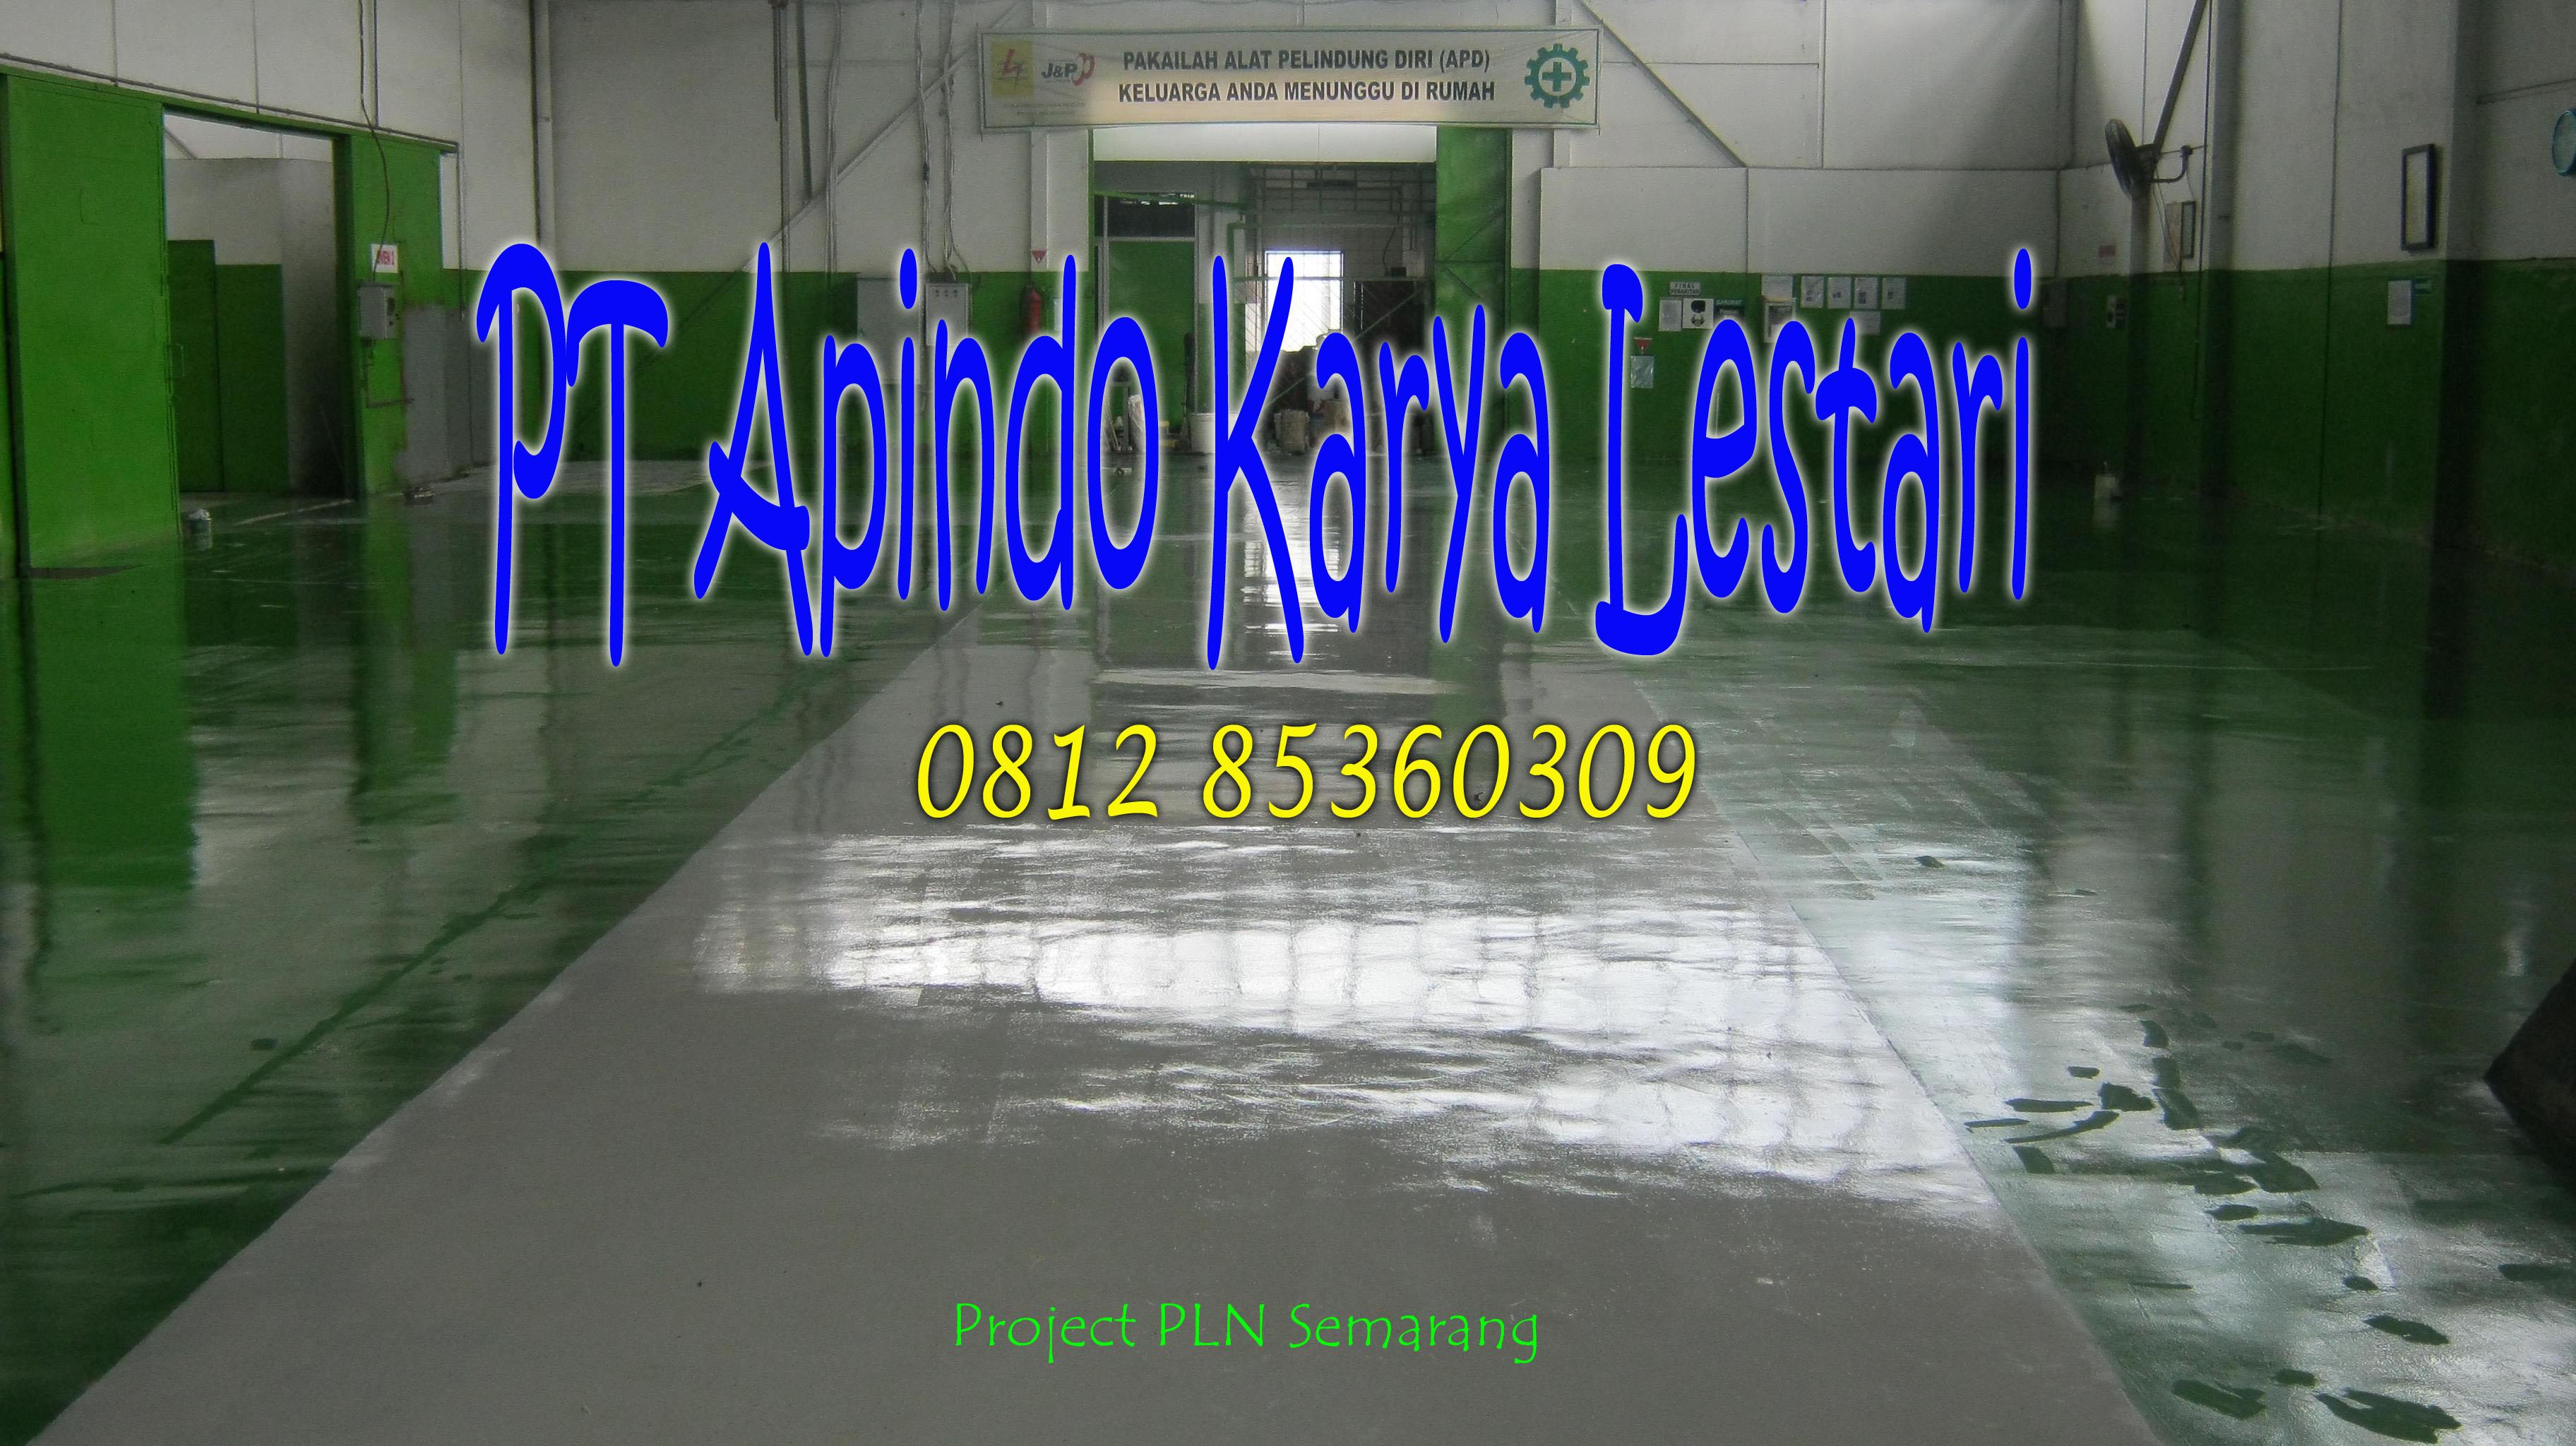 Kontraktor Epoxy Lantai Padang